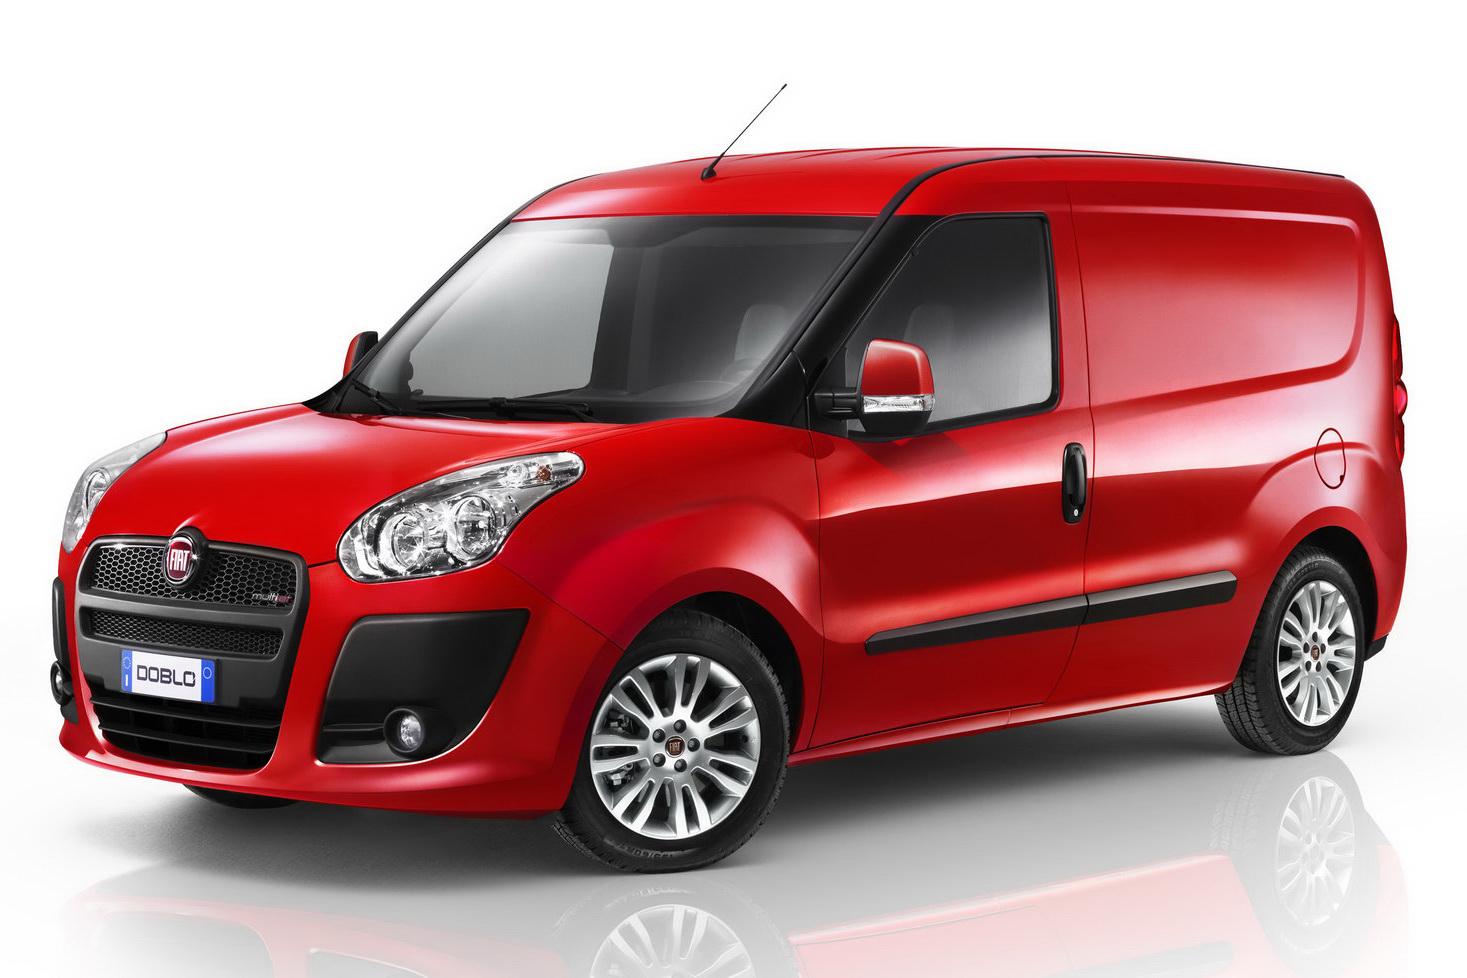 fiat doblo car technical data car specifications vehicle fuel consumption information. Black Bedroom Furniture Sets. Home Design Ideas